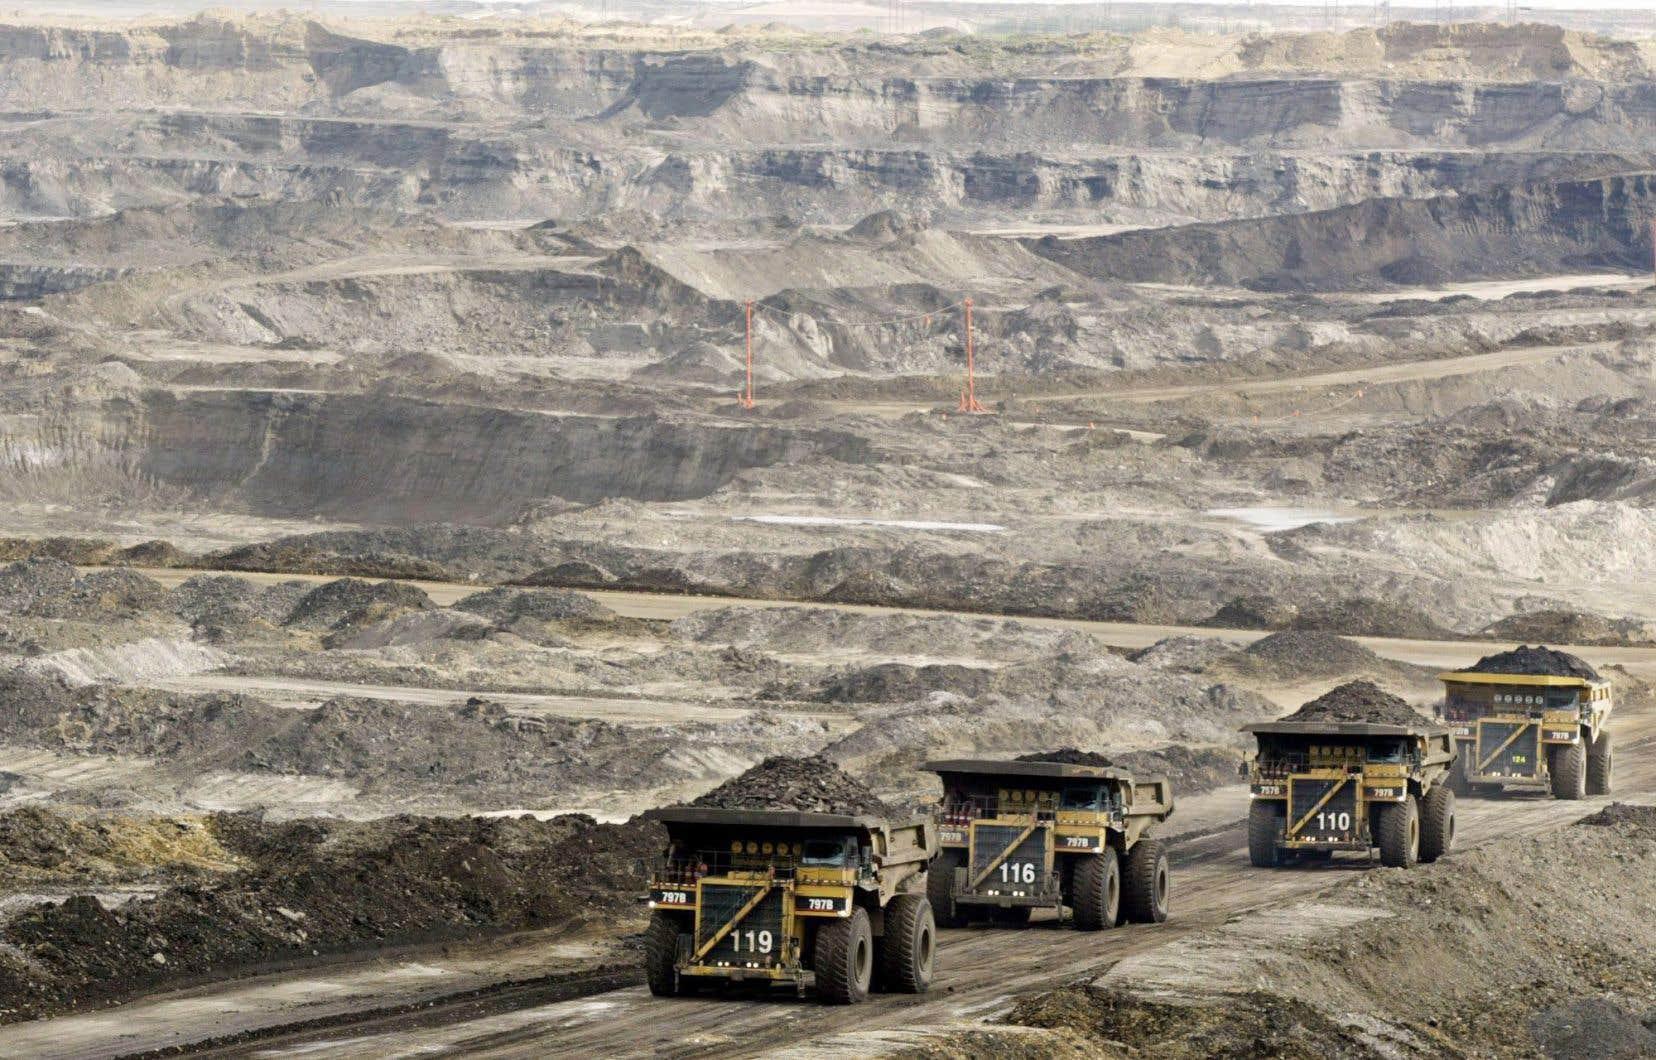 À Fort McMurray, en Alberta, des mastodontes chargés de sables bitumineux se dirigent vers l'usine de transformation.